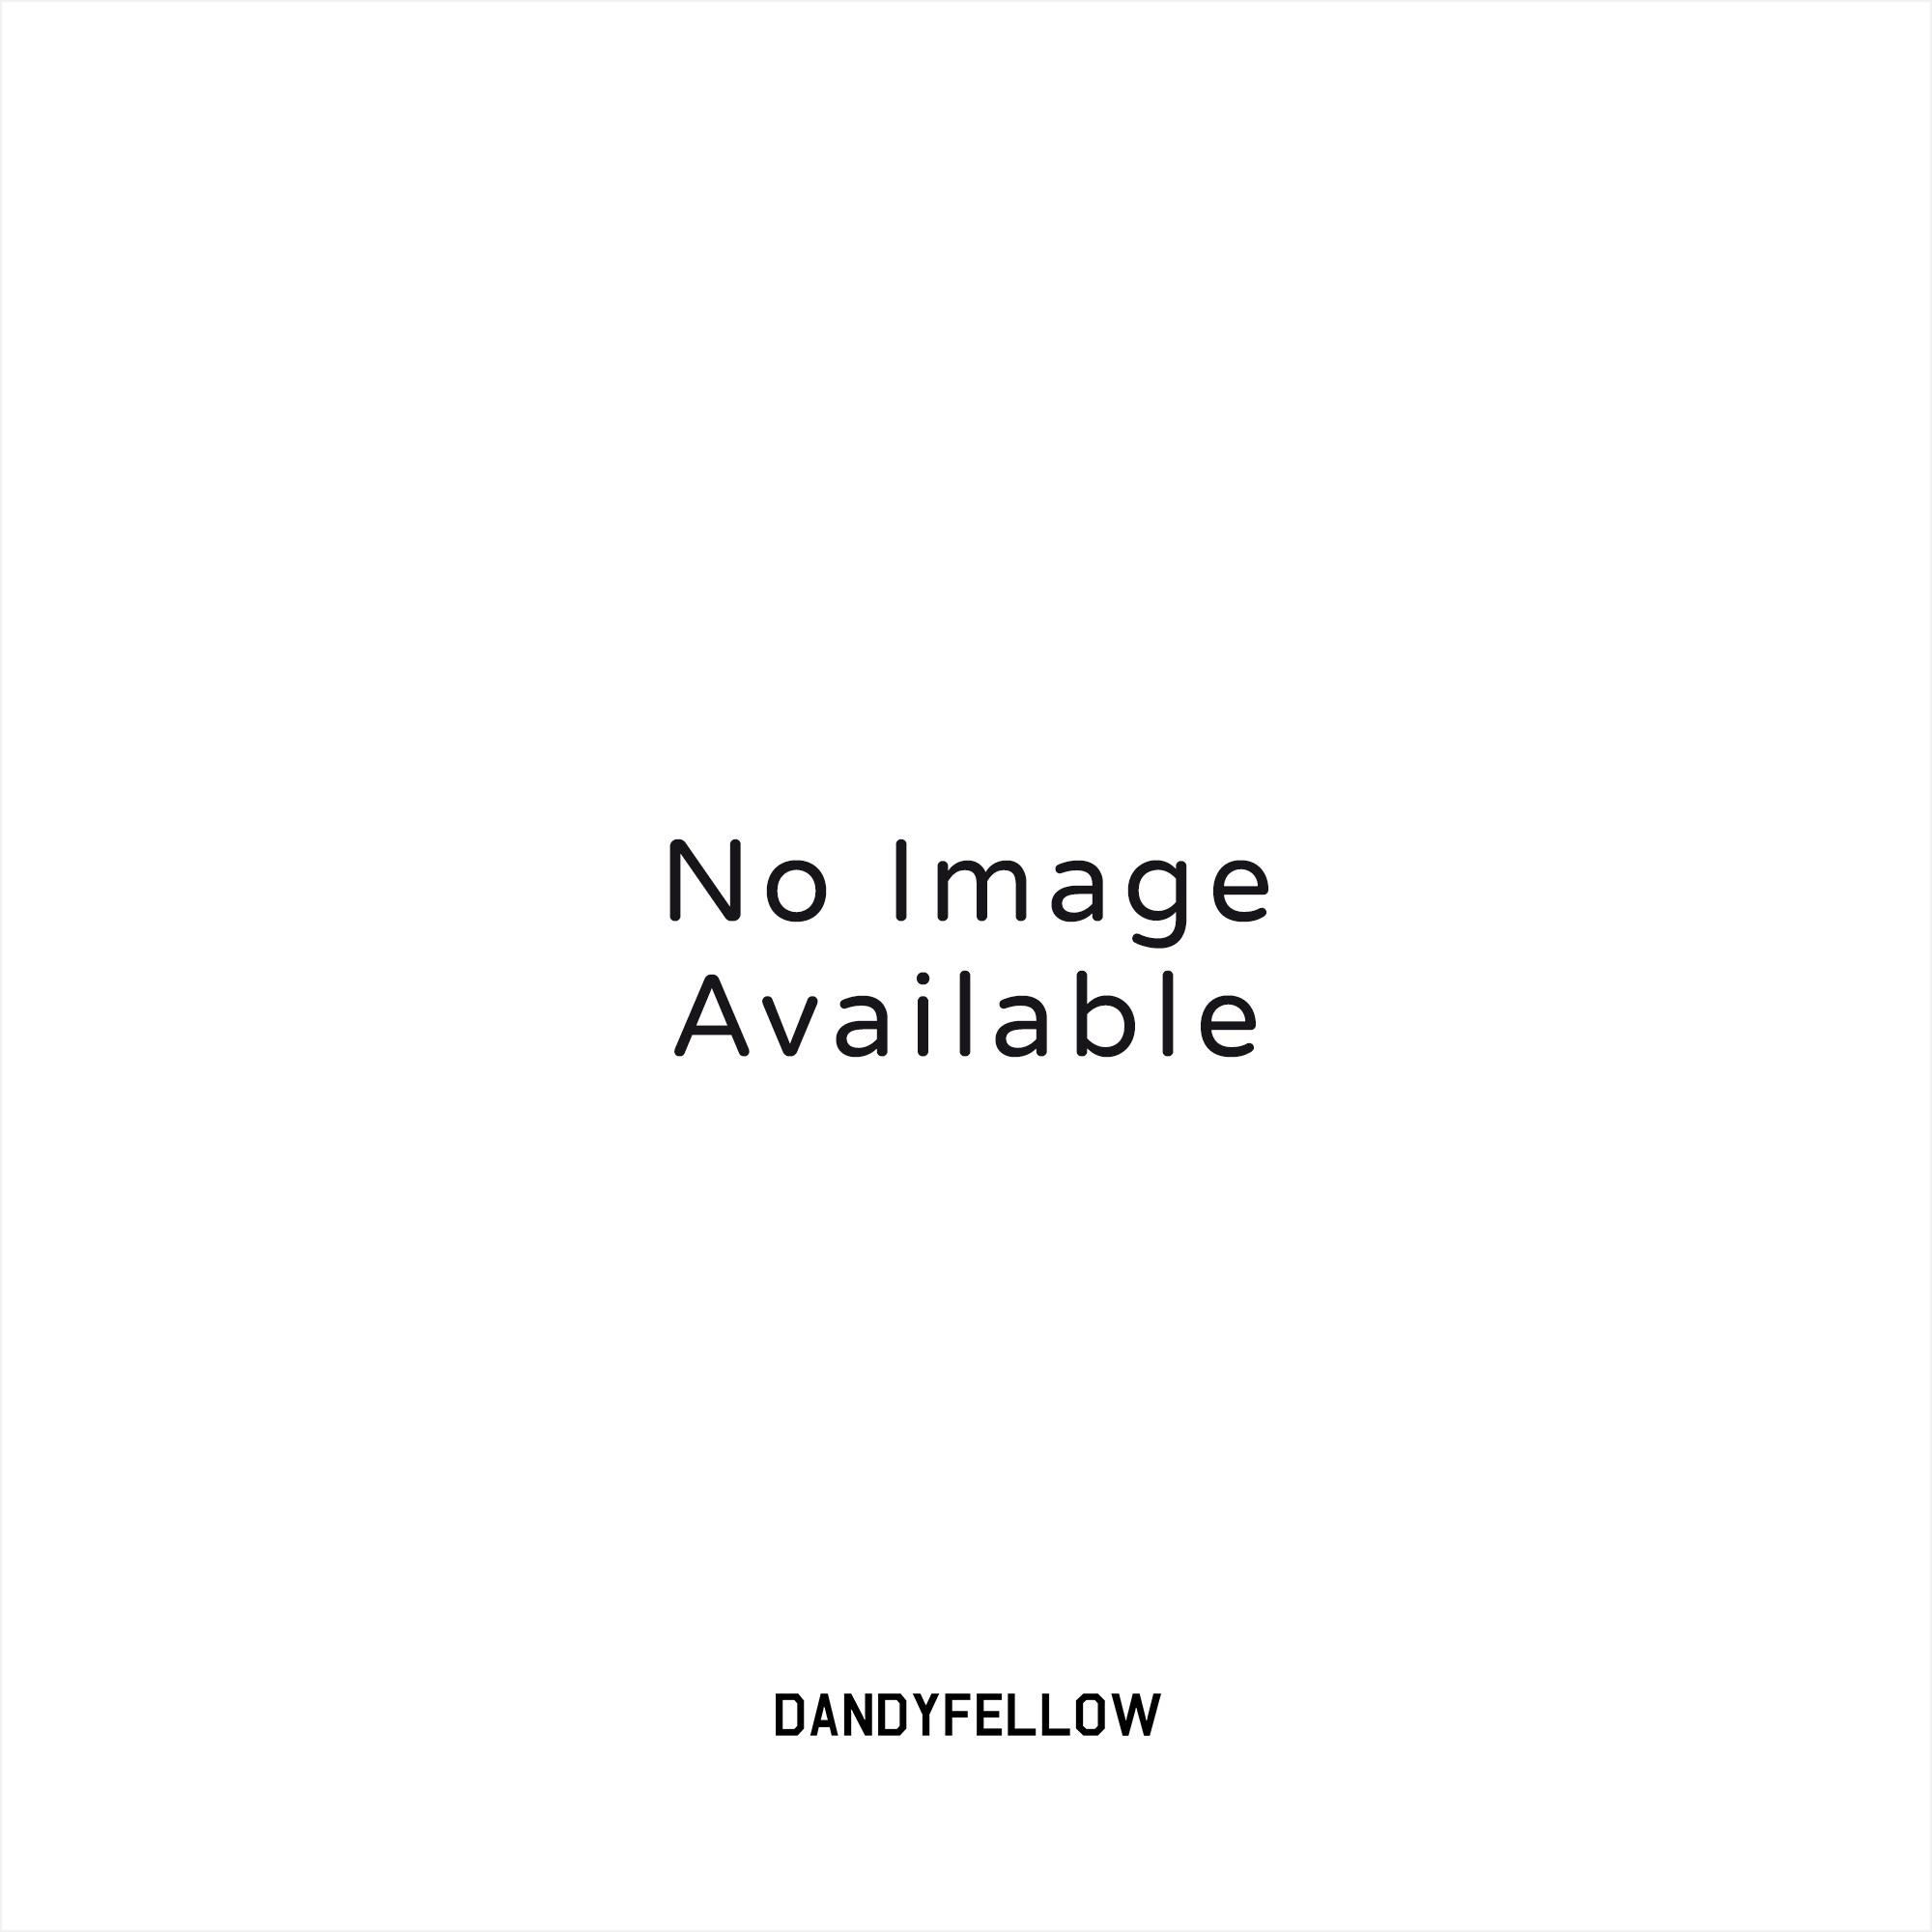 Paul Smith Blue Thin-Stripe Shirt JPFJ-765P-D39